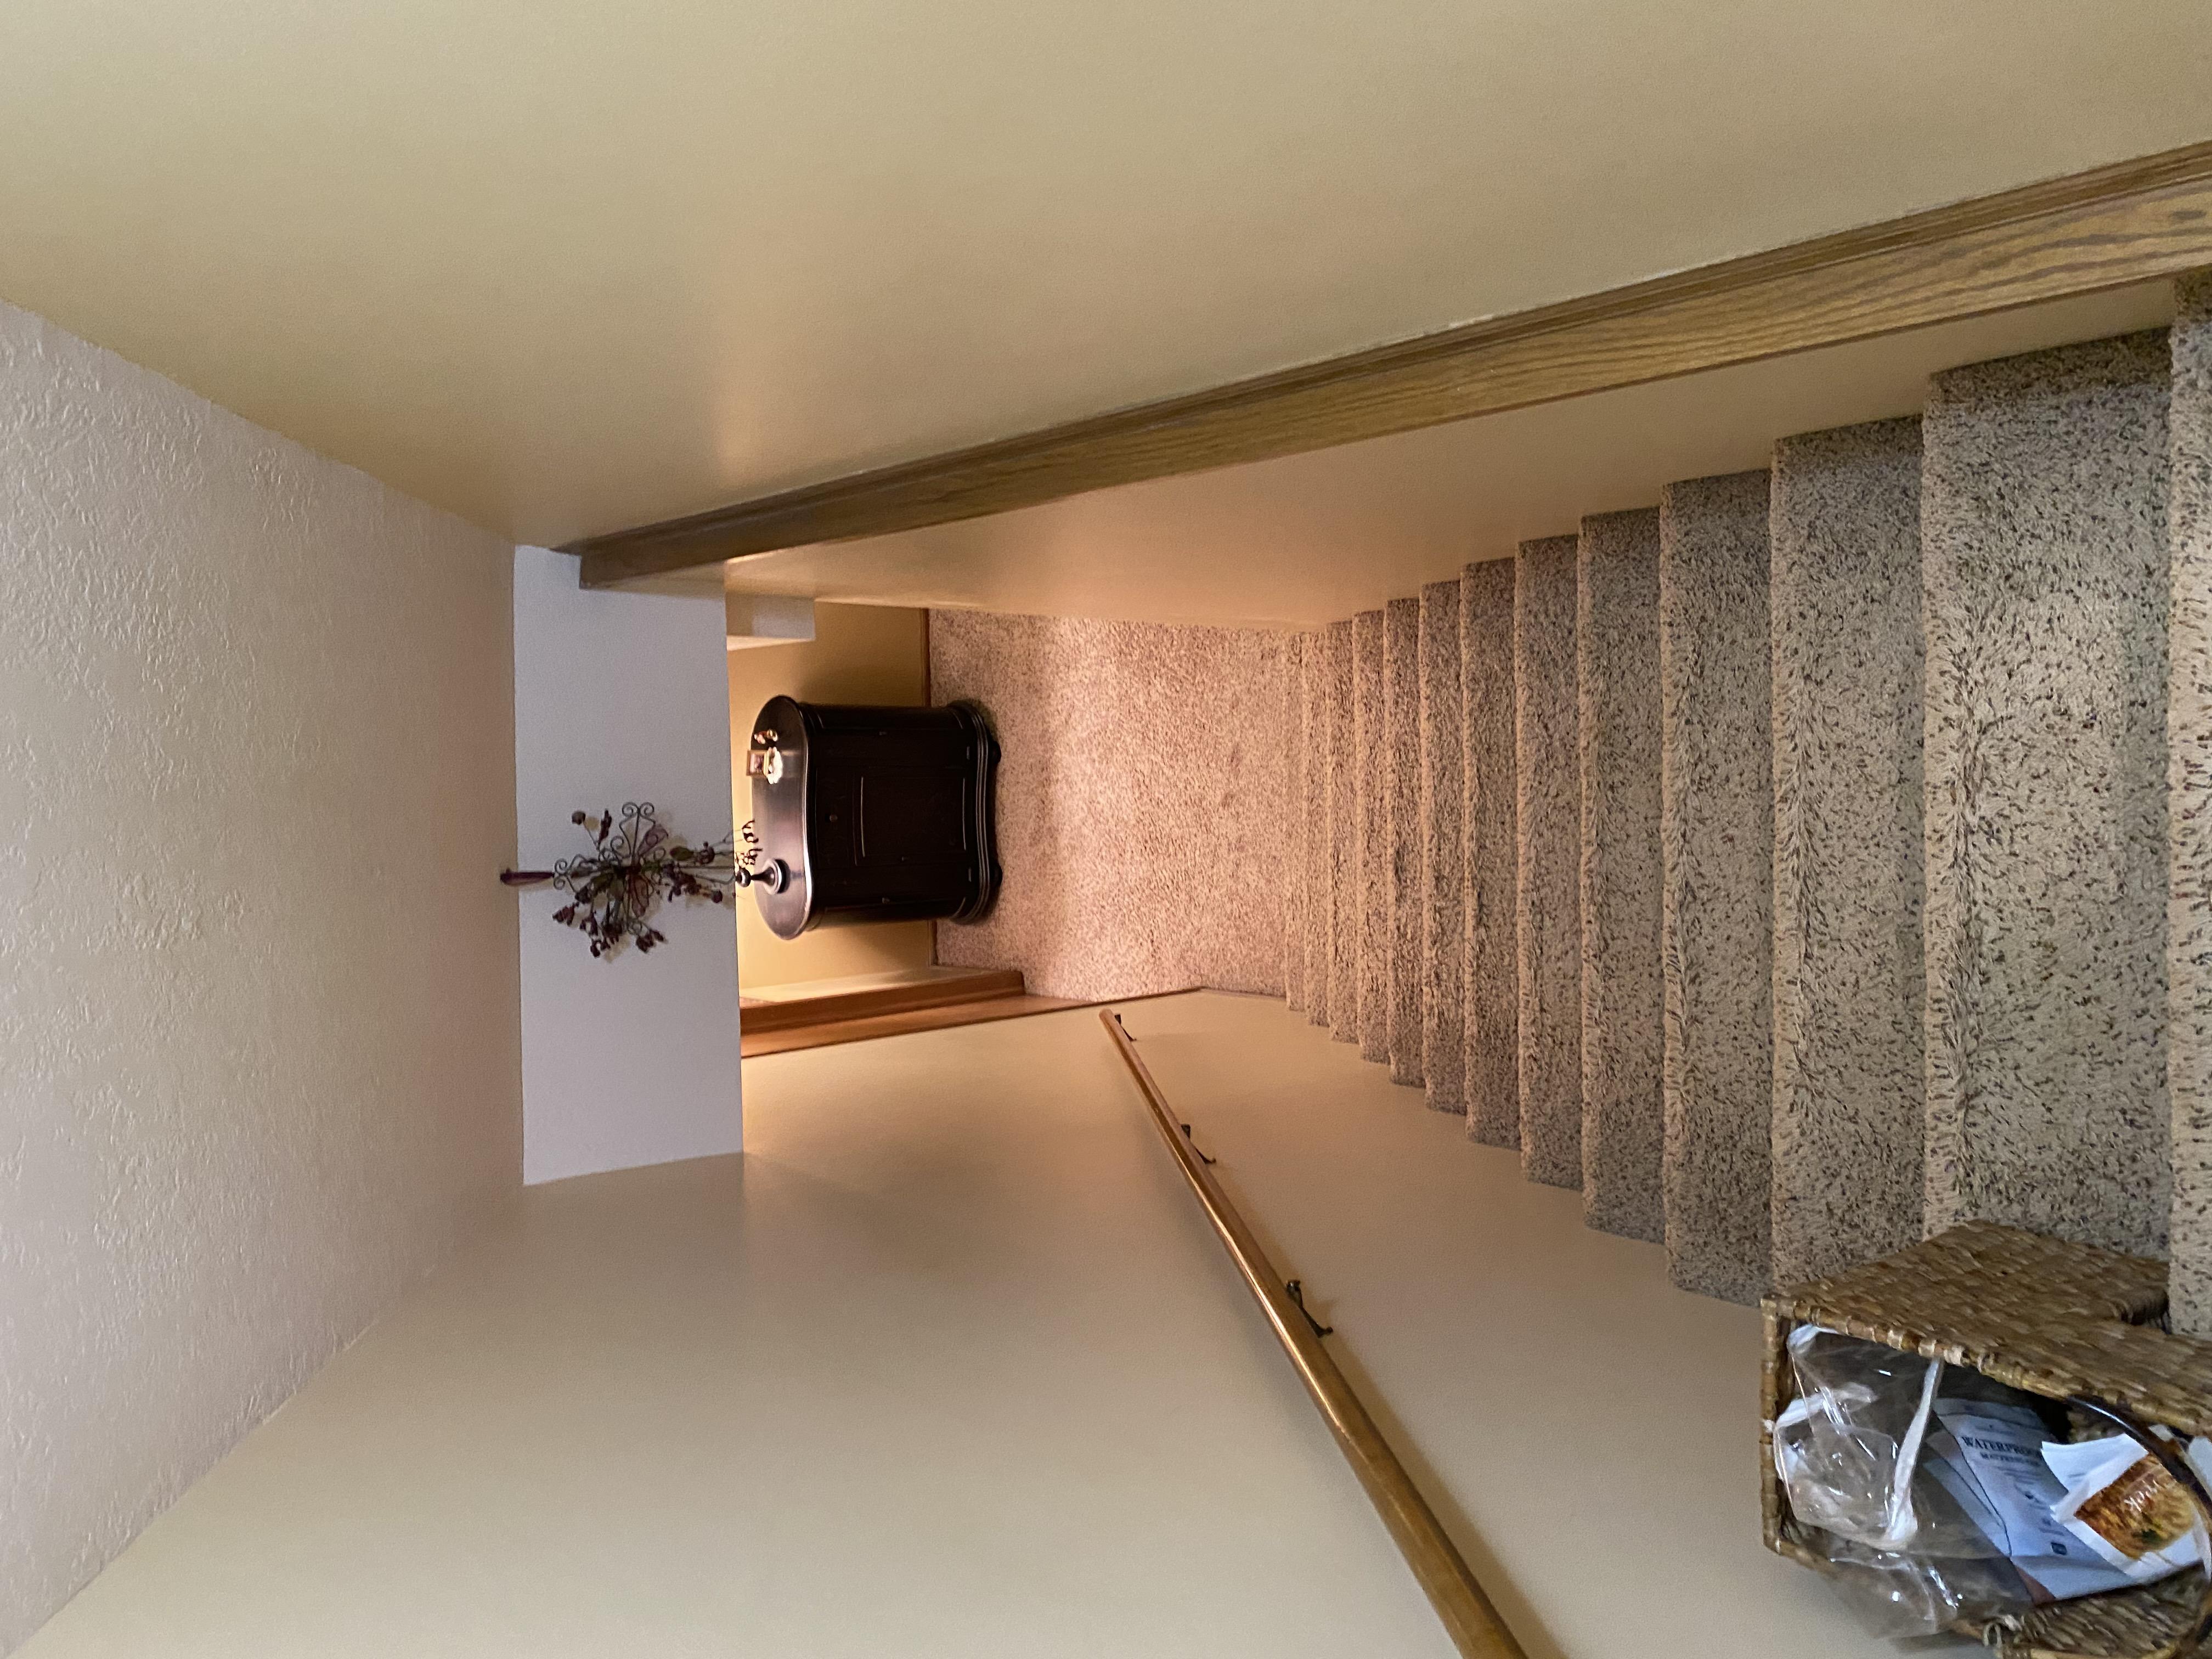 2058 HIllside Ave Mondamin basement1